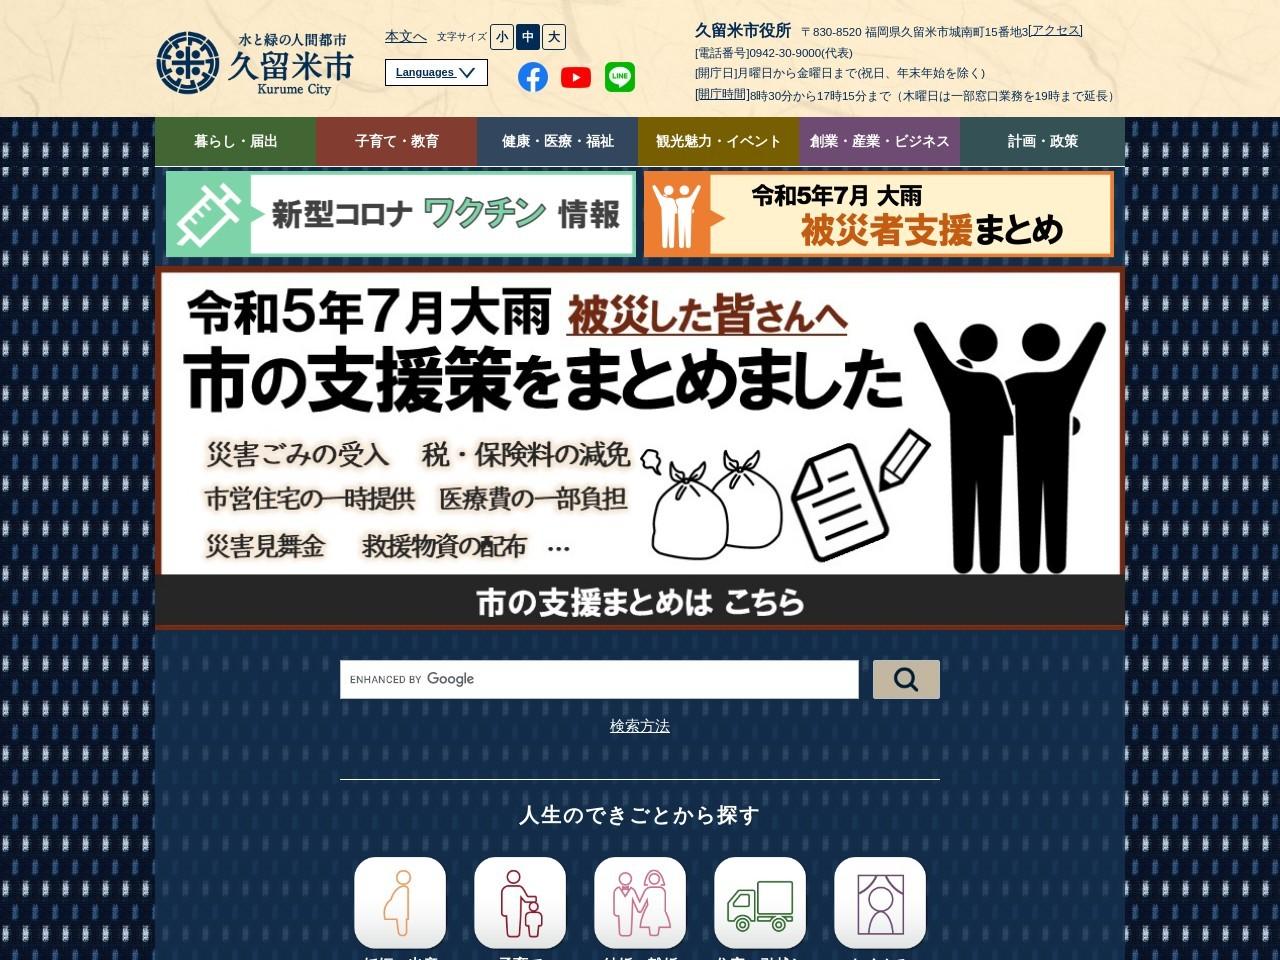 http://www.city.kurume.fukuoka.jp/1500soshiki/9002sinkatu/3010oshirase/2017-1030-1440-319.html